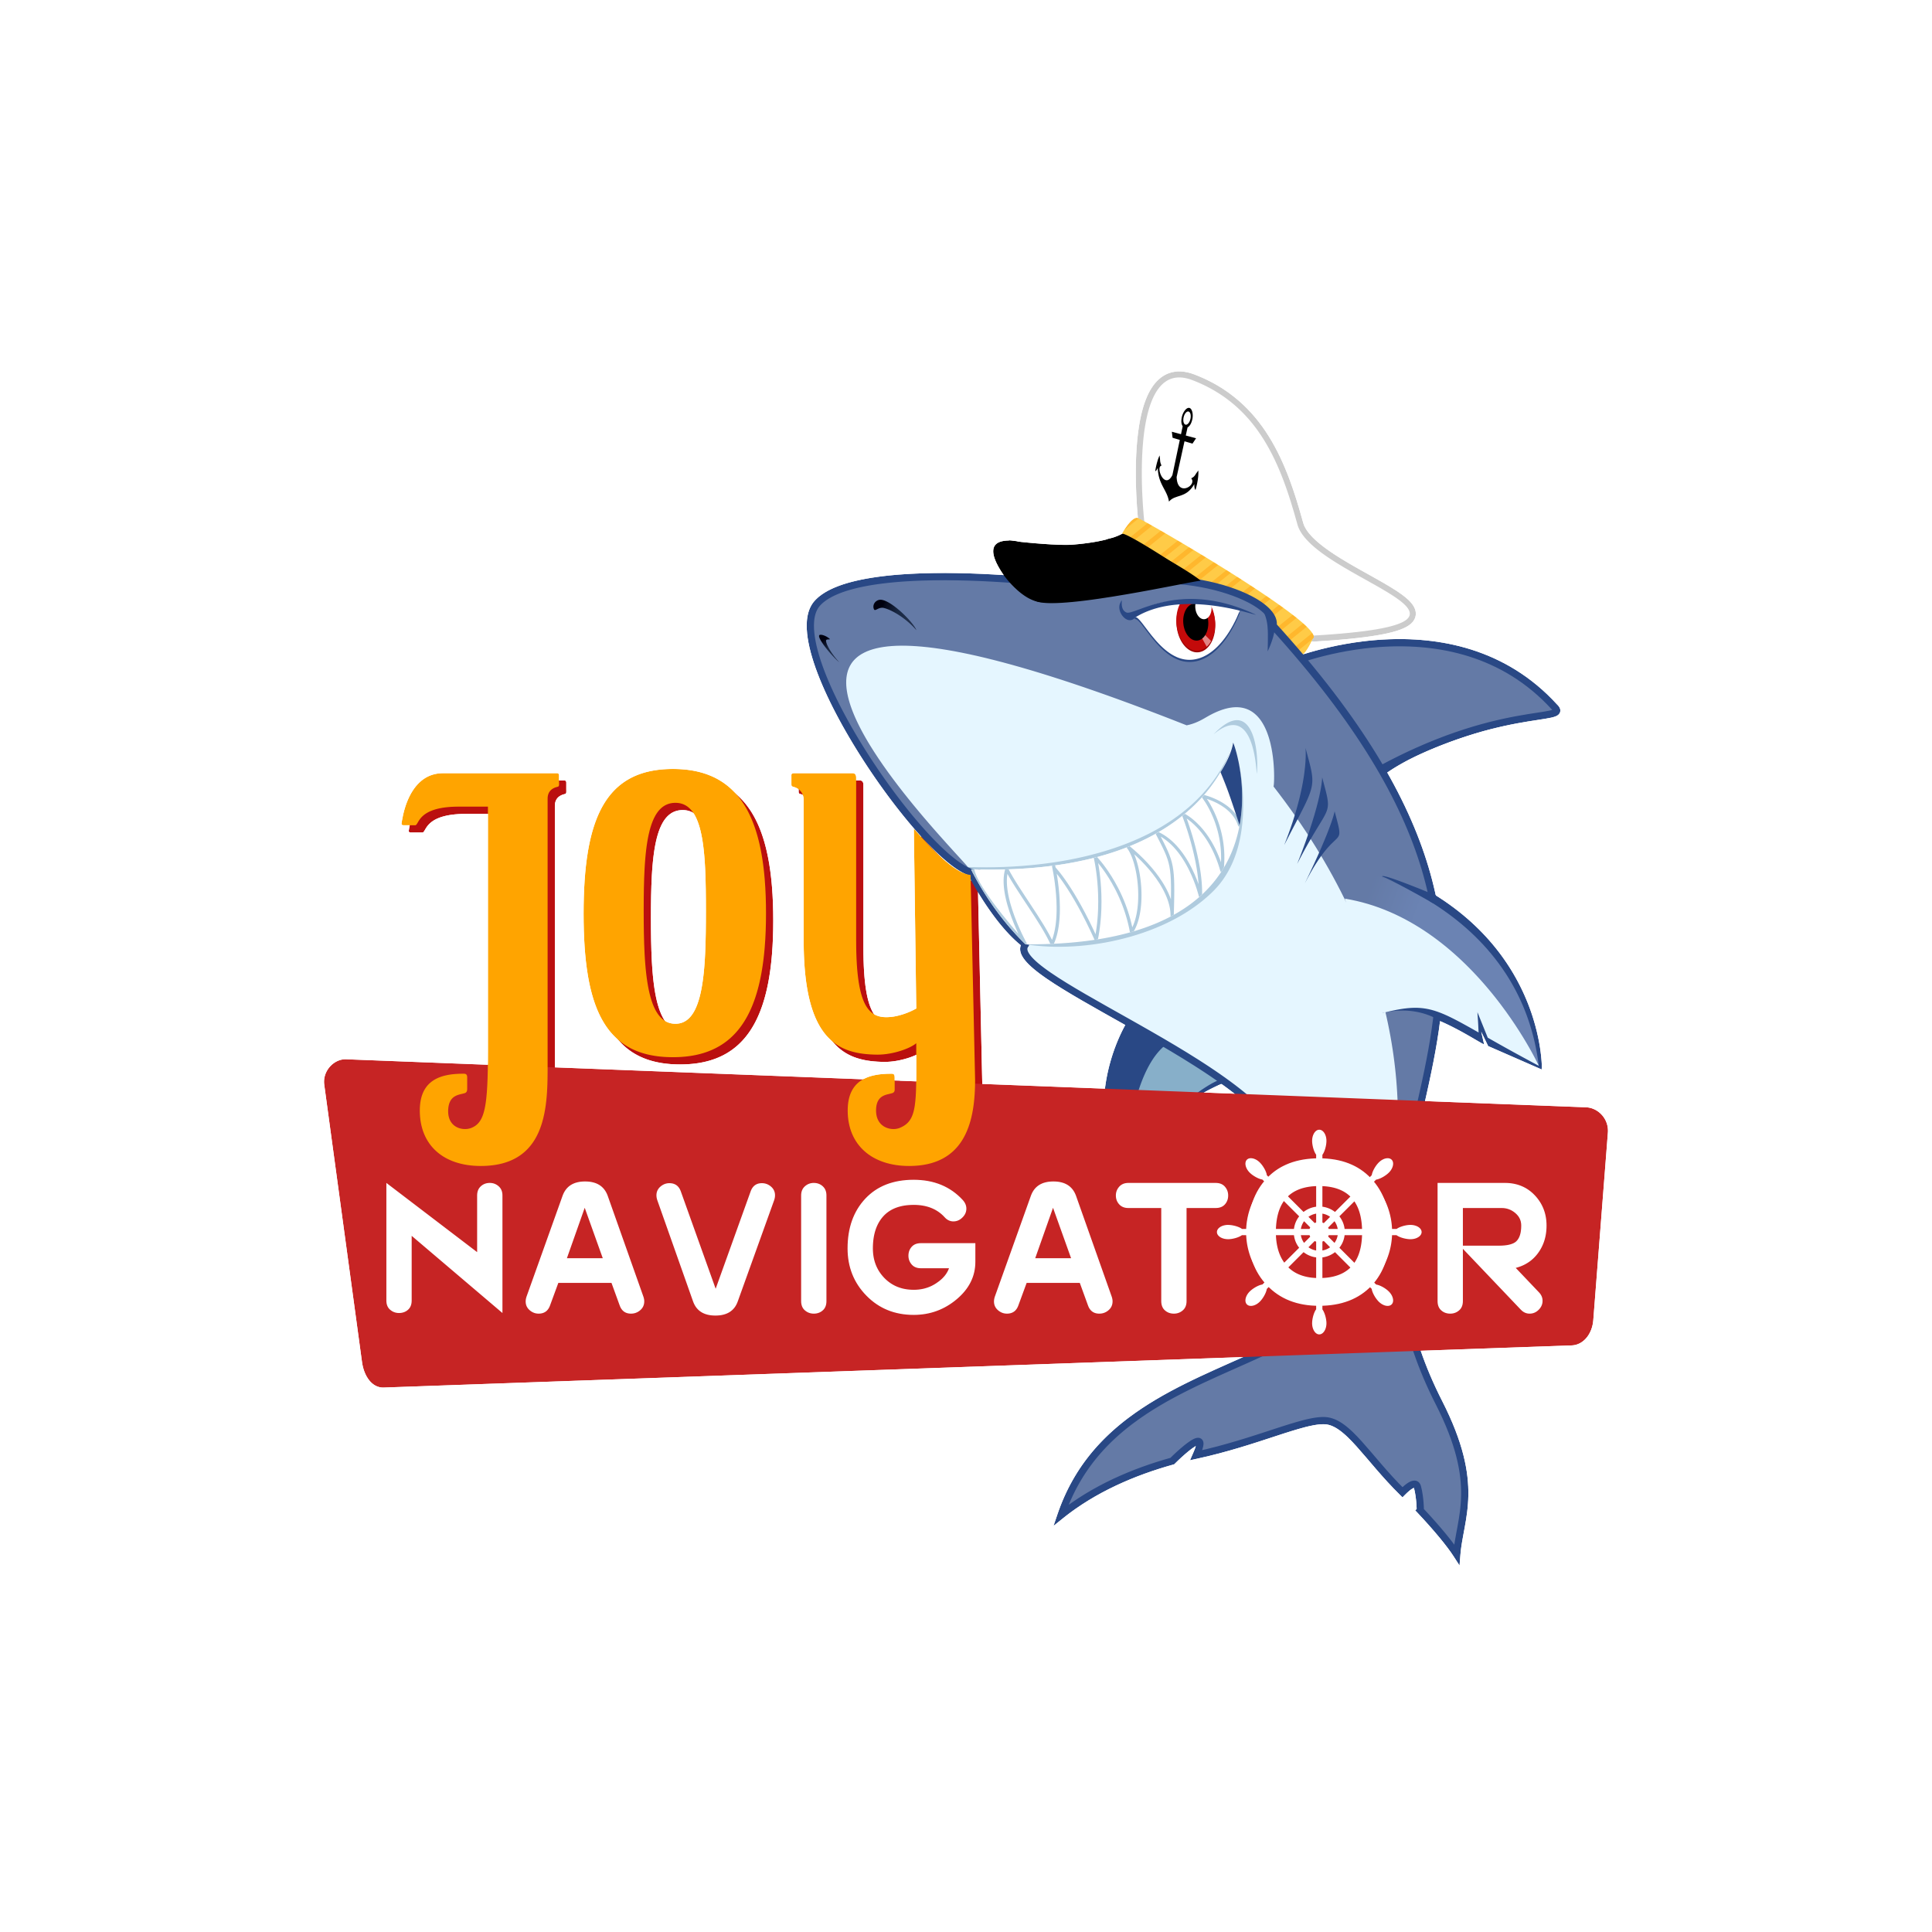 JOY NAVIGATOR - logo